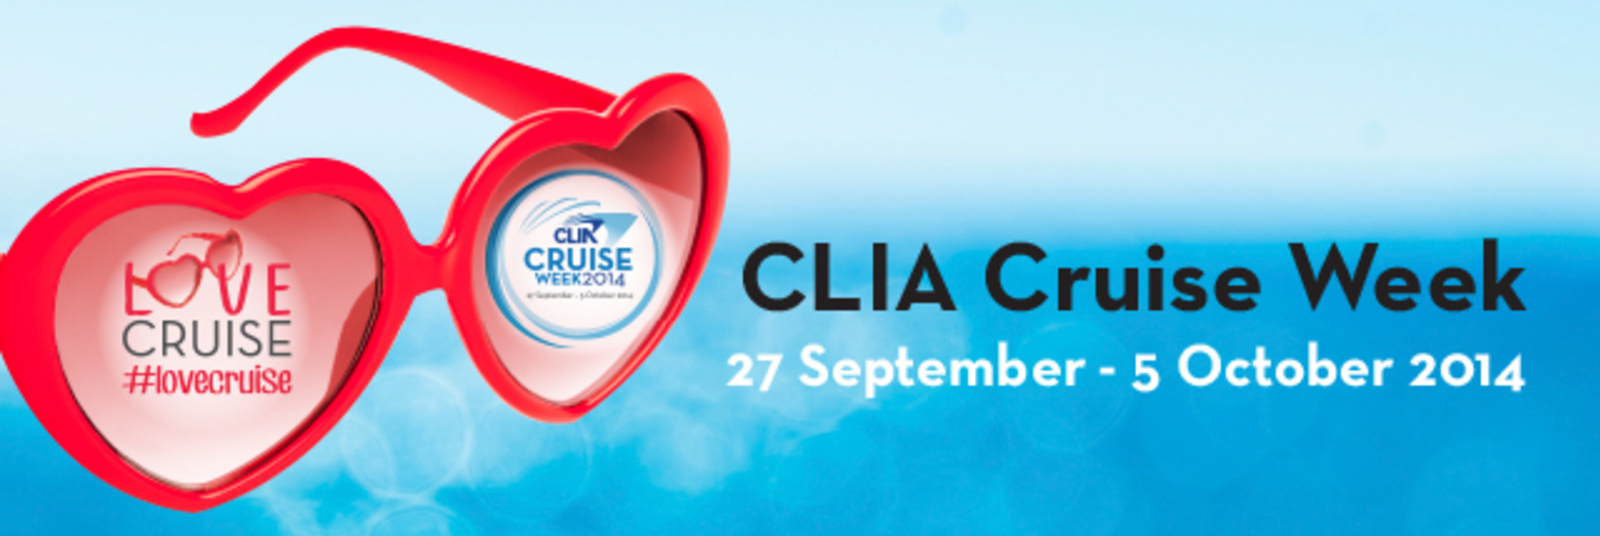 Homepage_large_clia_cruise_week_tis_640x240